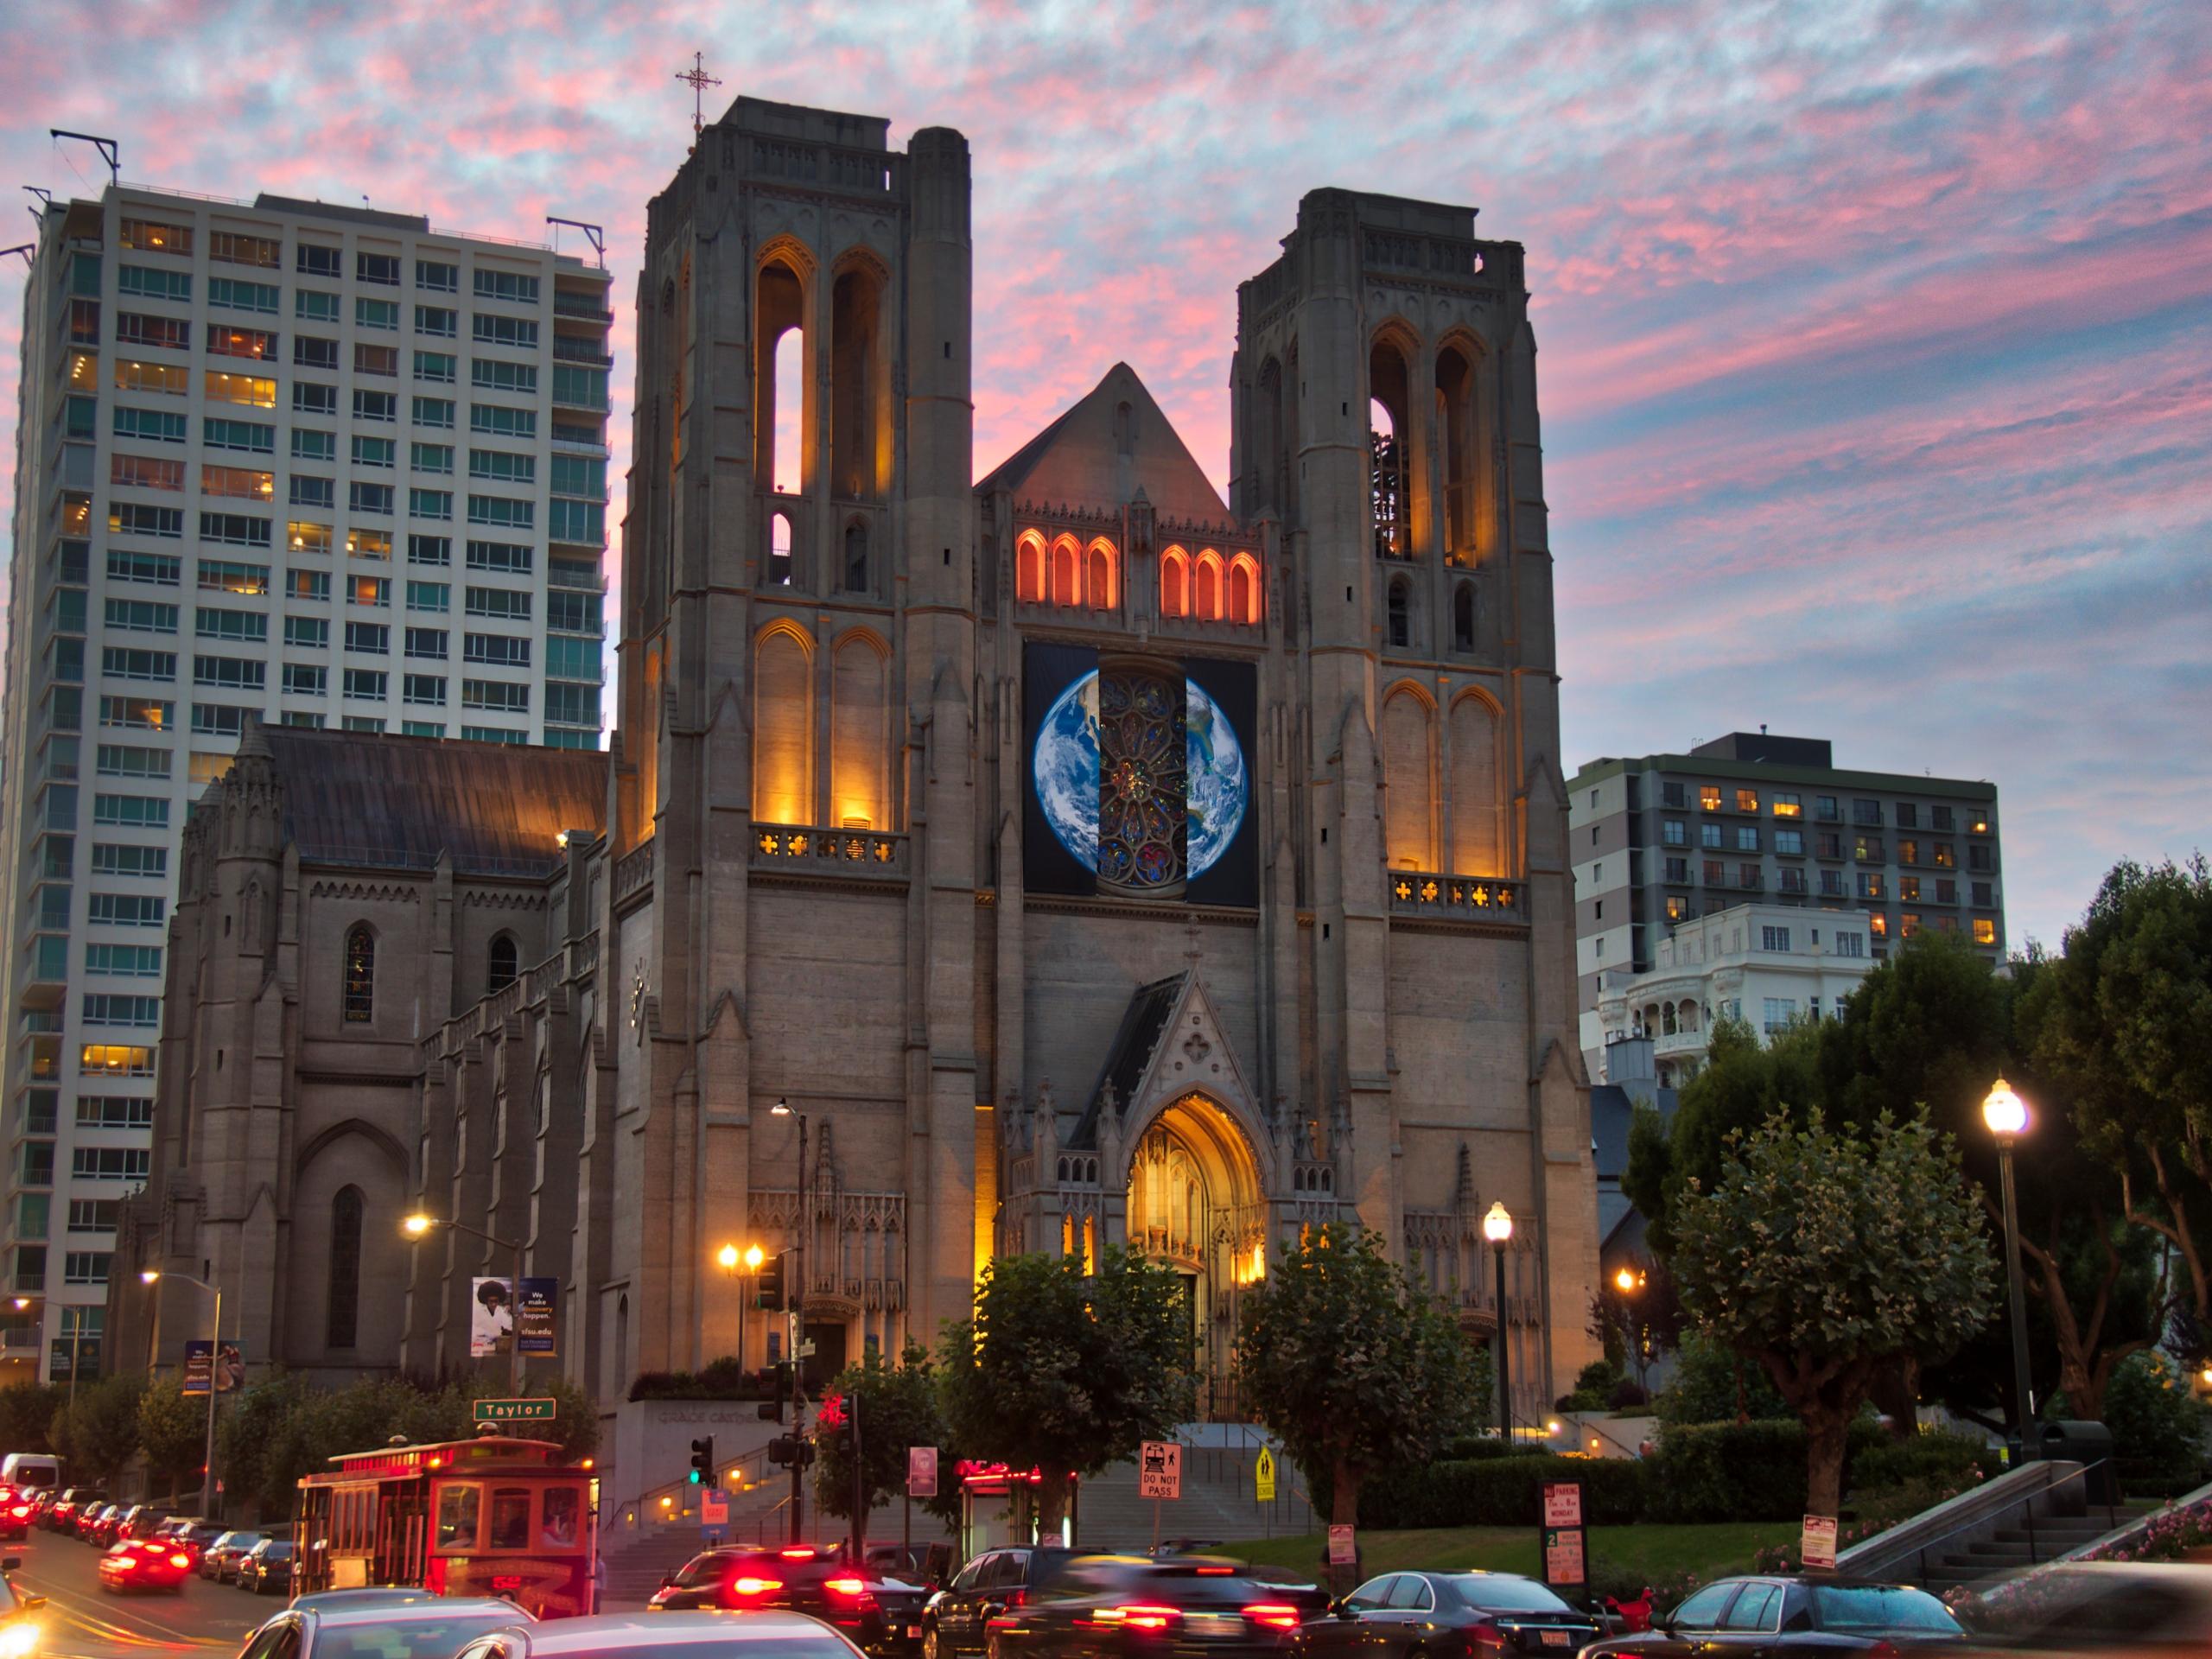 Cathedral - San Francisco Sunse - neilhoward | ello